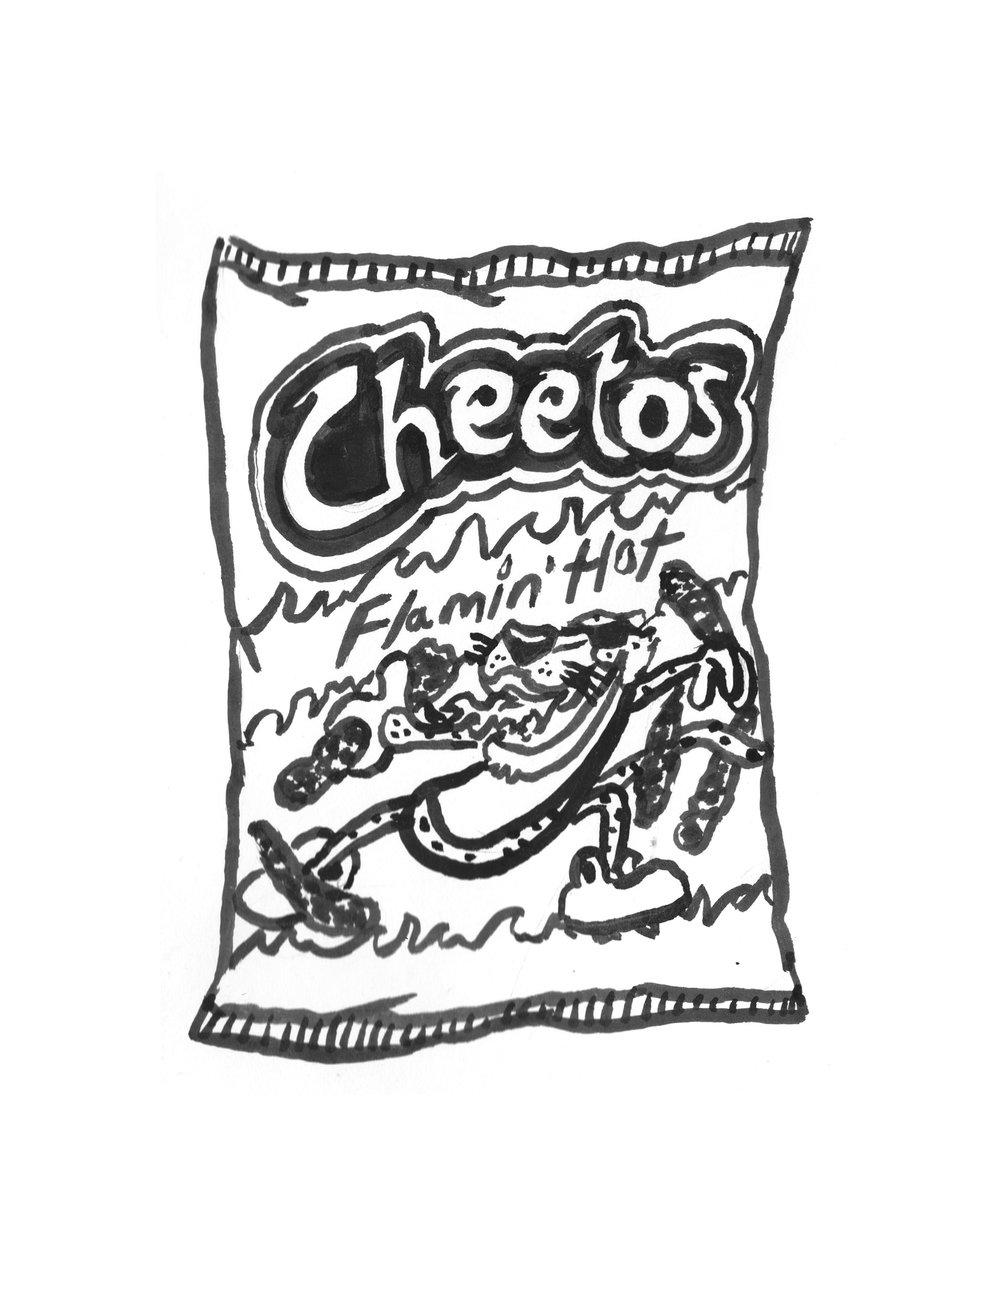 Cheetos clipart black and white Jpg Reps Foster MICOTTI flaminhotcheetos